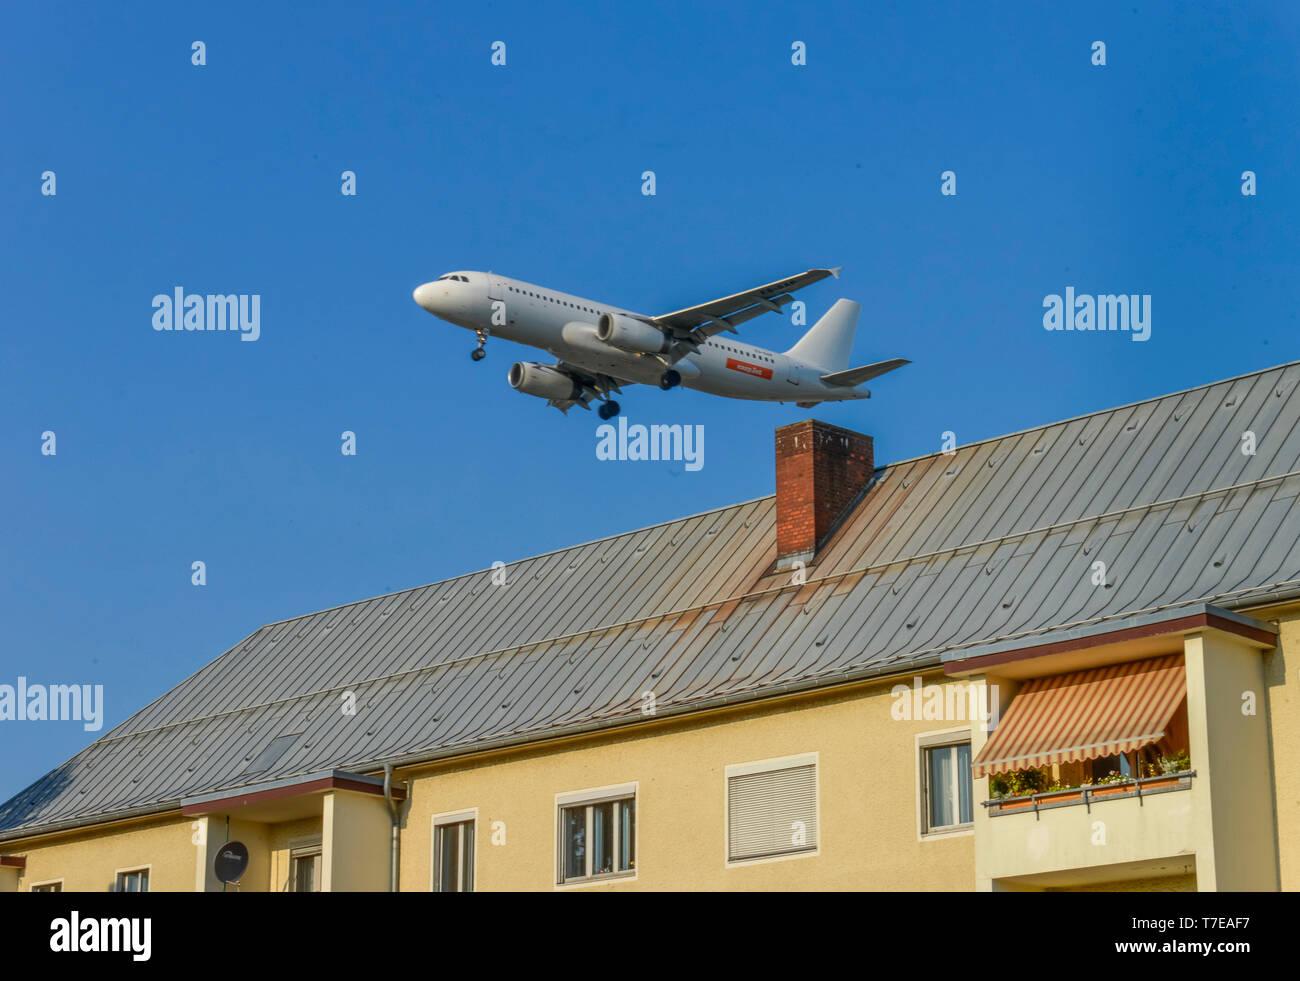 Flugzeug, Landeanflug, Tegel, Reinickendorf, Berlin, Deutschland - Stock Image